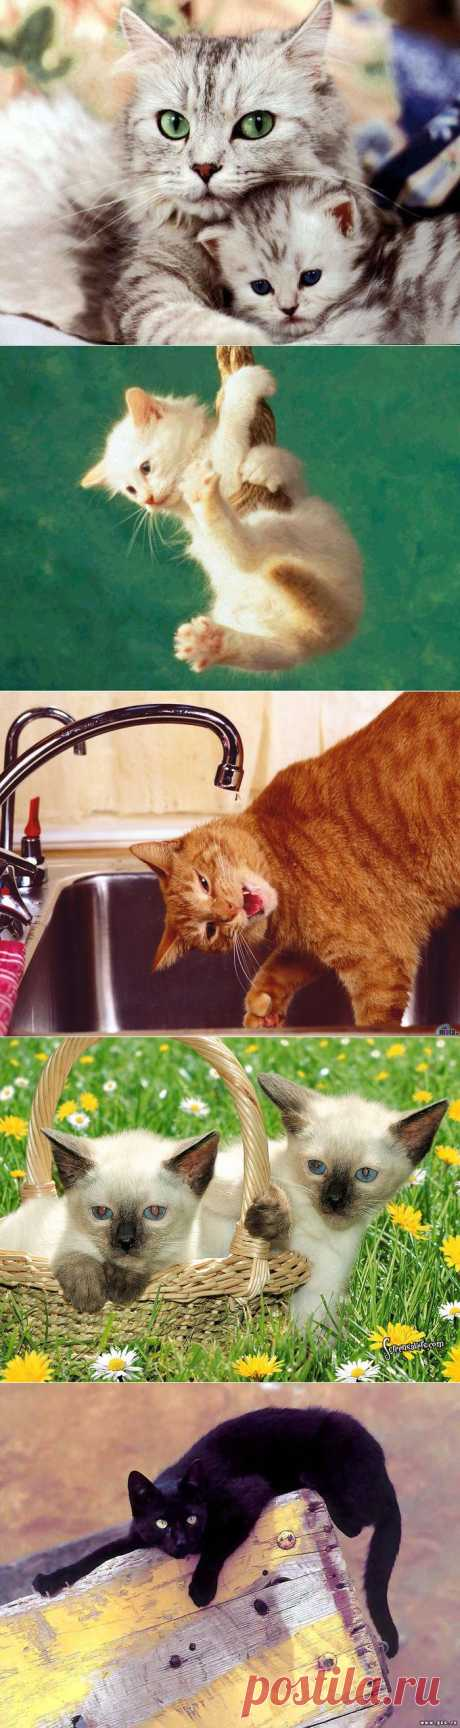 Кошак - хозяин и вожак!.